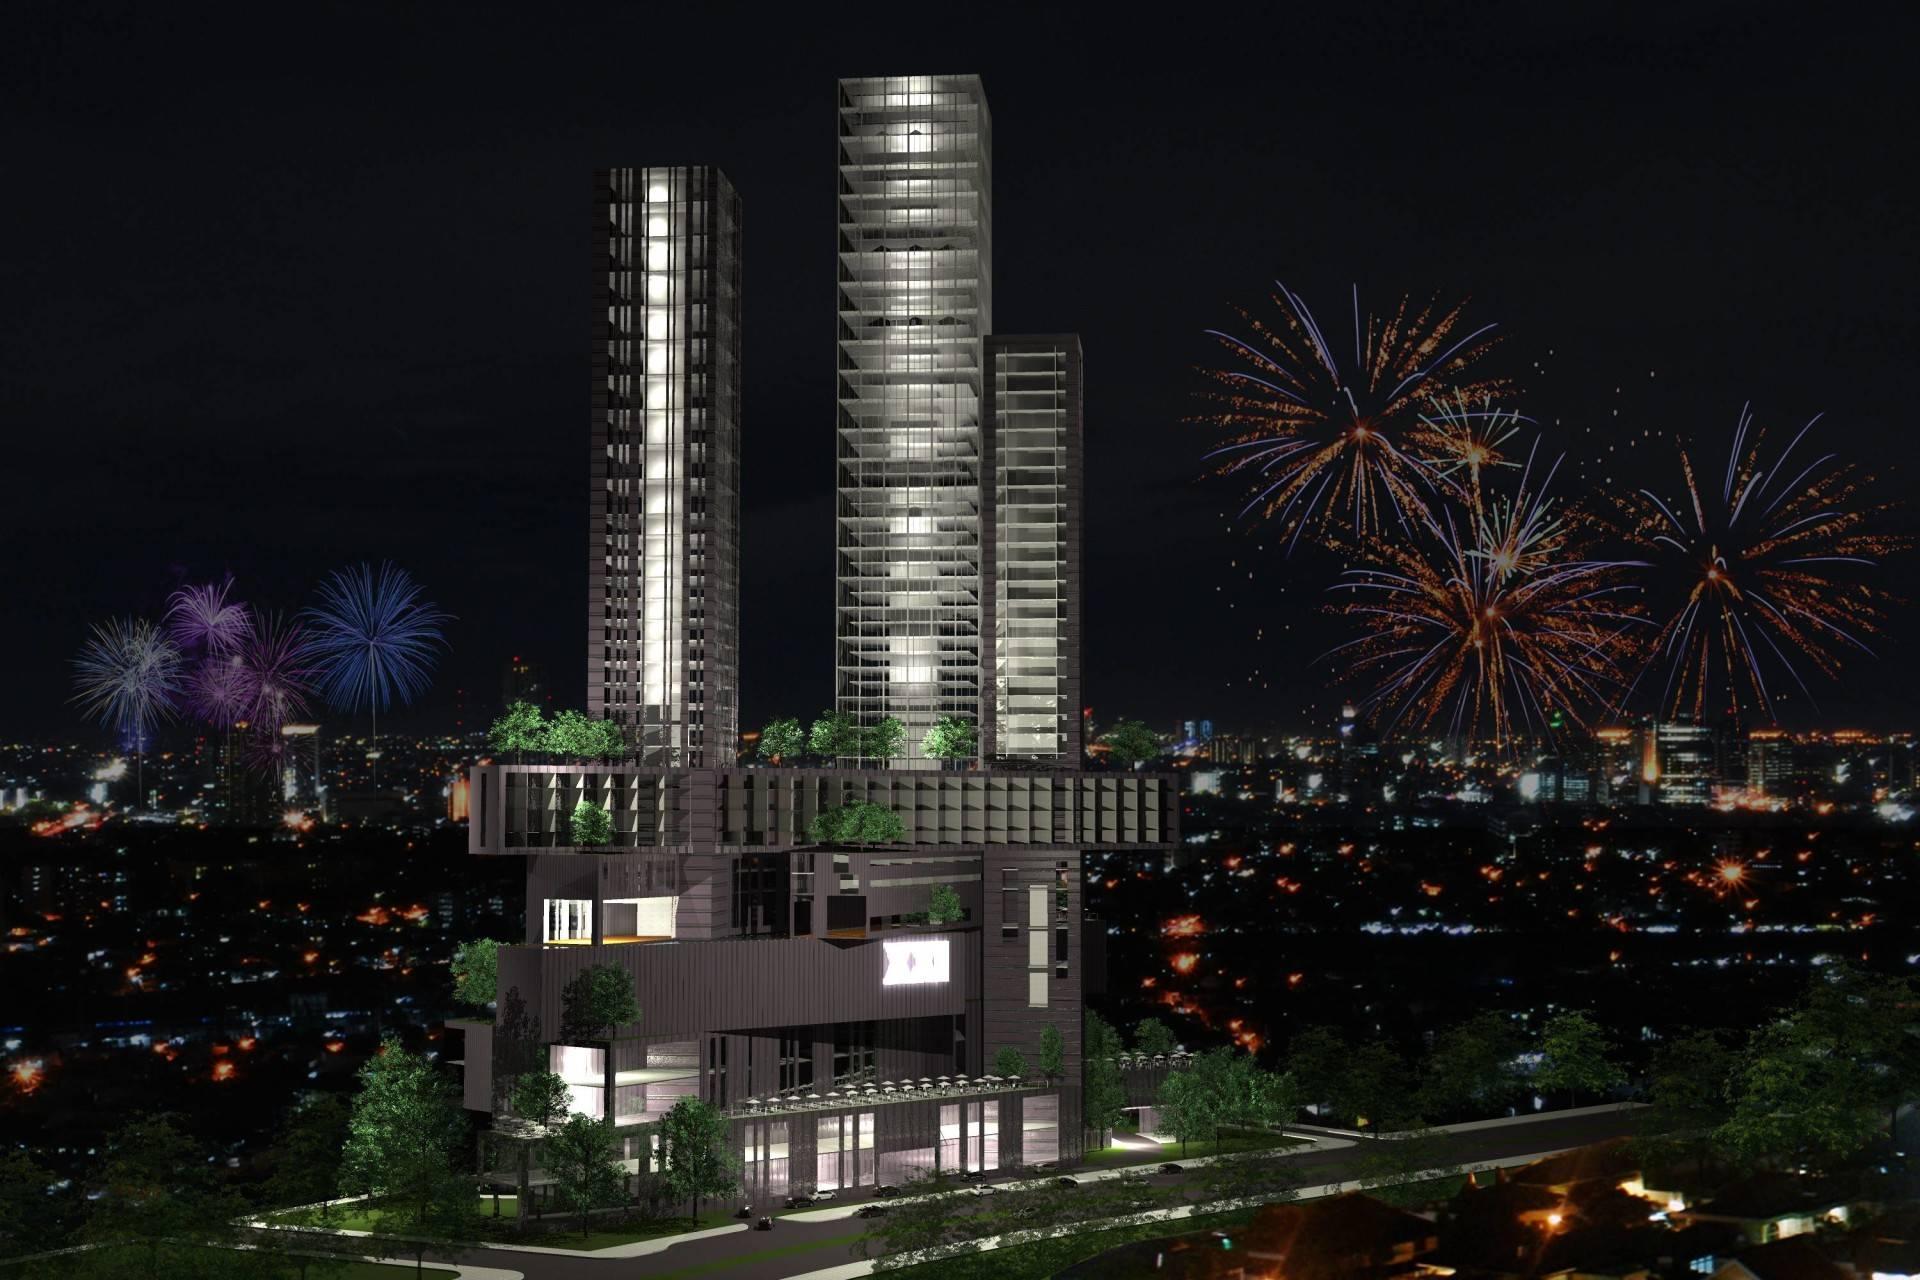 Monokroma Architect Platinum Condominium South Tangerang, Banten South Tangerang, Banten Front View Modern  6838